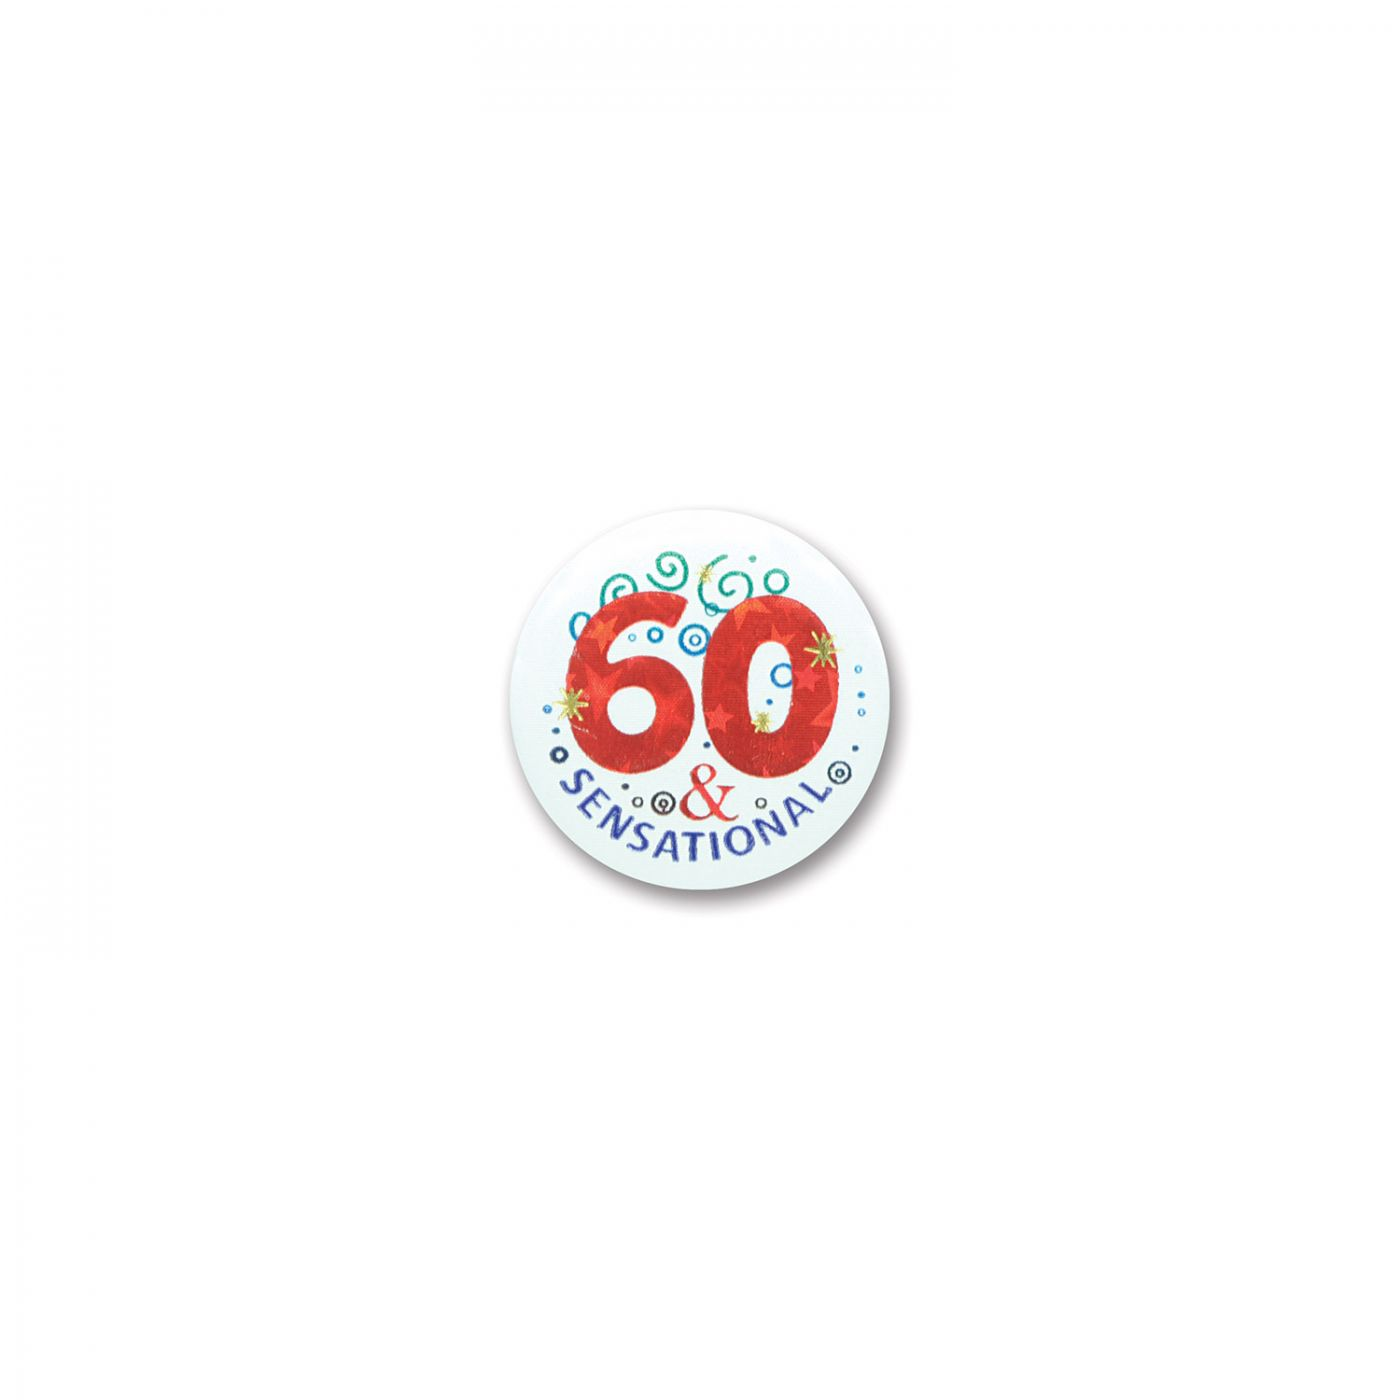 Image of 60 & Sensational Satin Button (6)